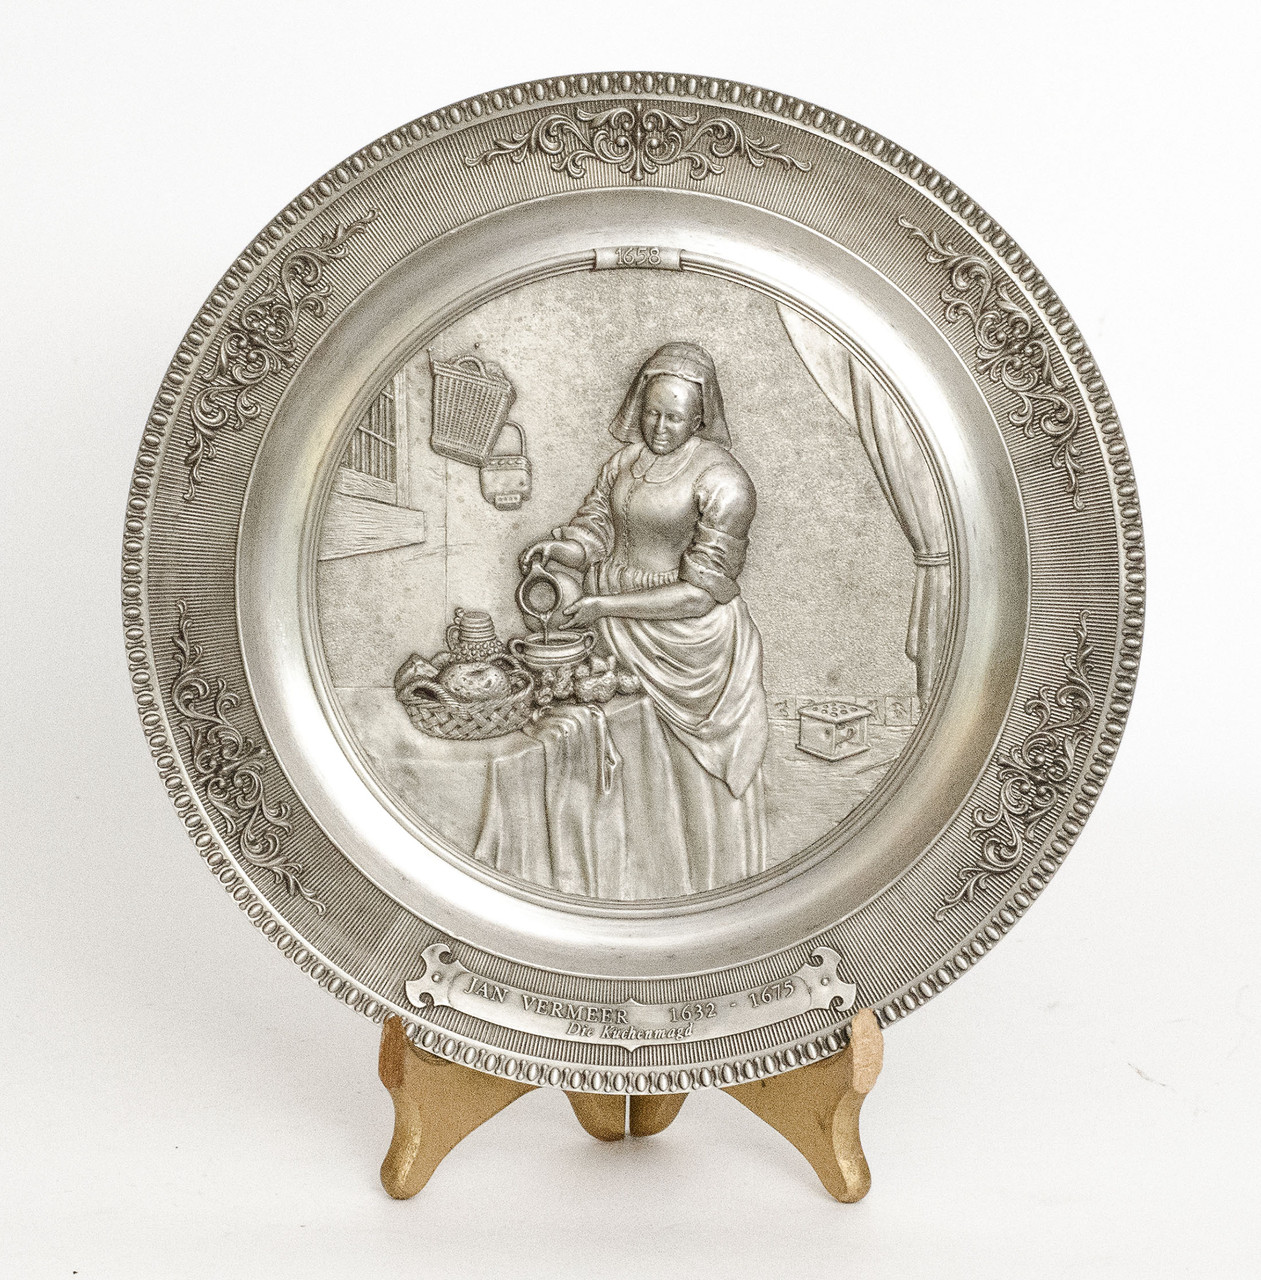 Тарелка настенная, олово, Германия, Молочница, Ян Вермер